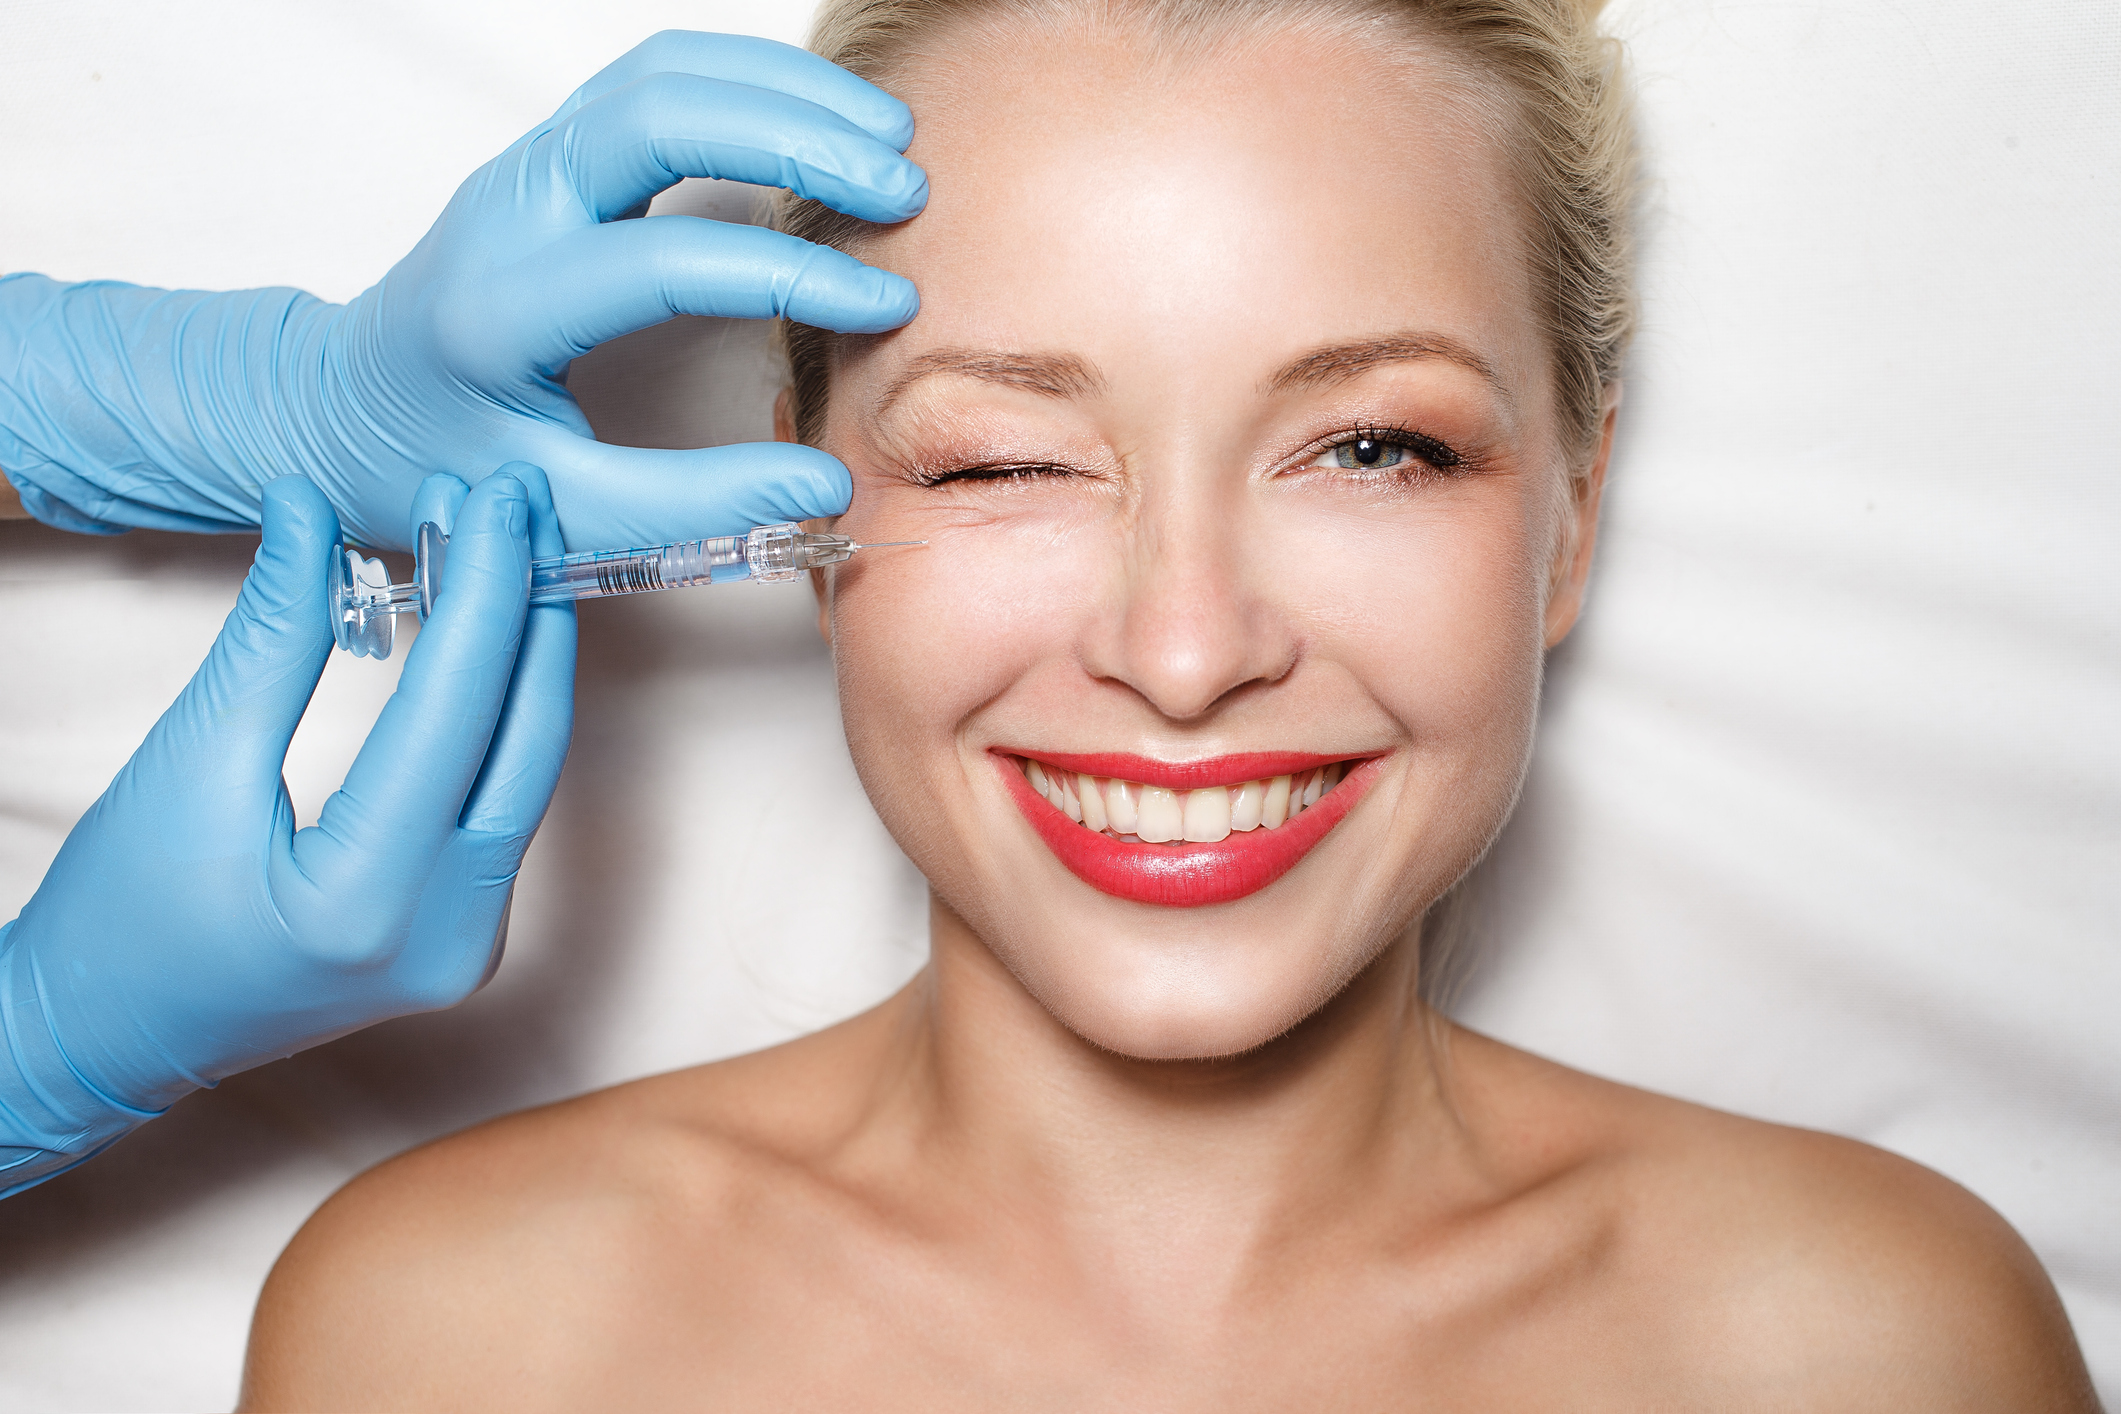 Conheça o Baby Botox, o procedimento que dá efeito ainda mais natural ao rosto